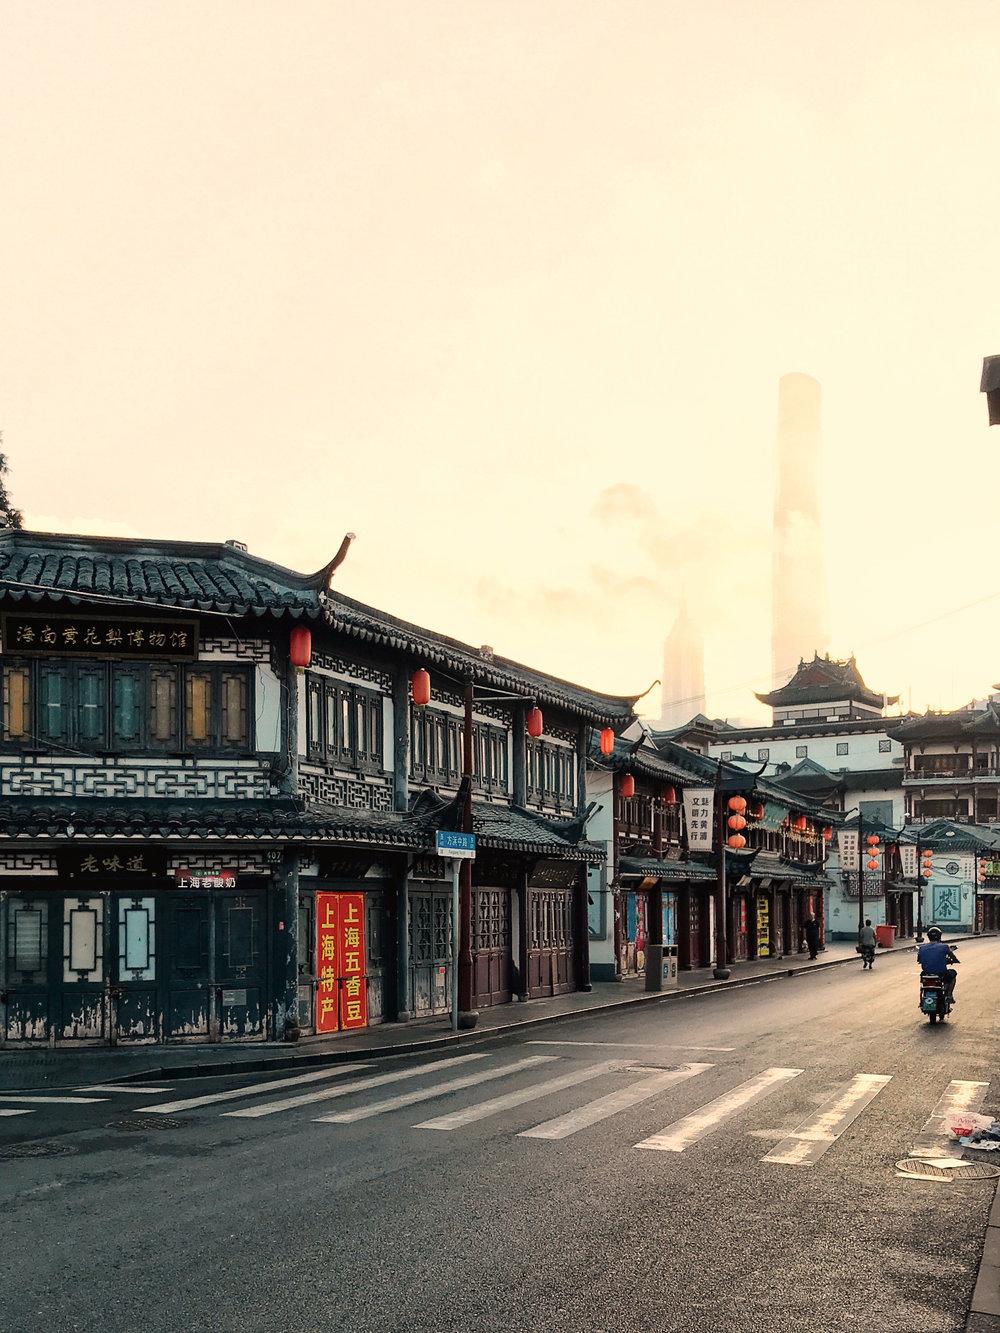 mornings in shanghai